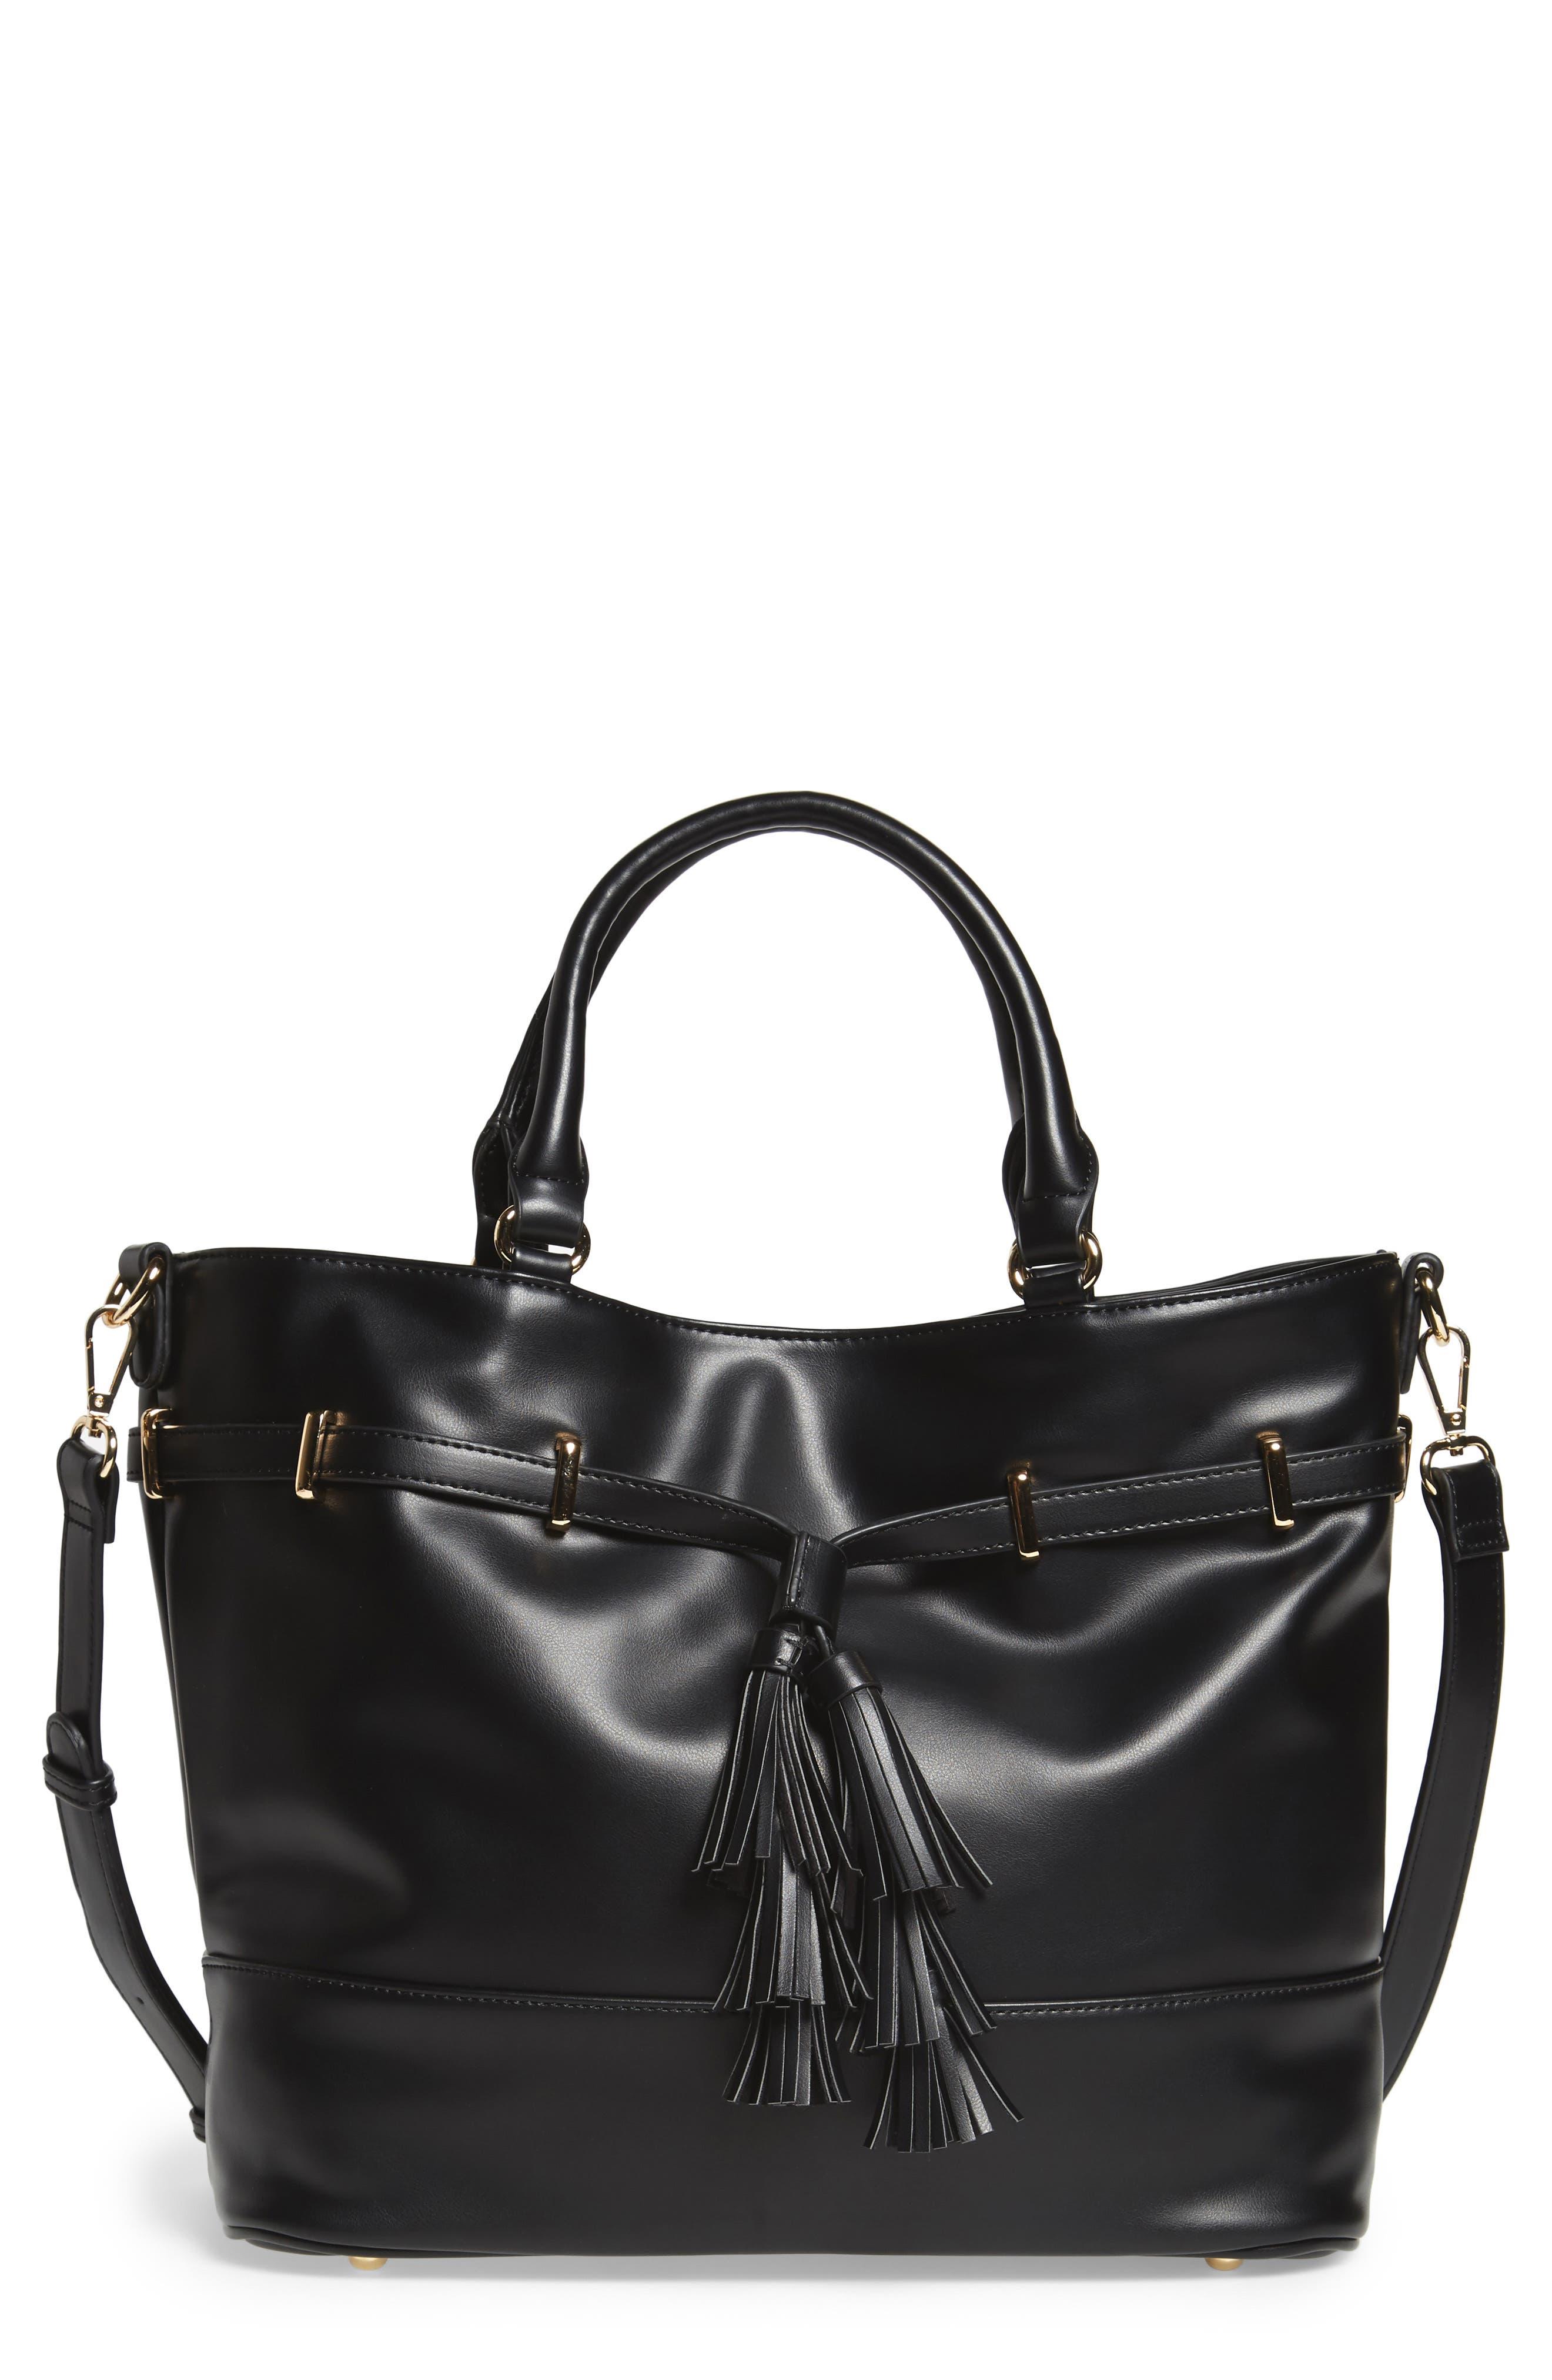 Ryka Tassel Faux Leather Tote,                             Main thumbnail 1, color,                             Black